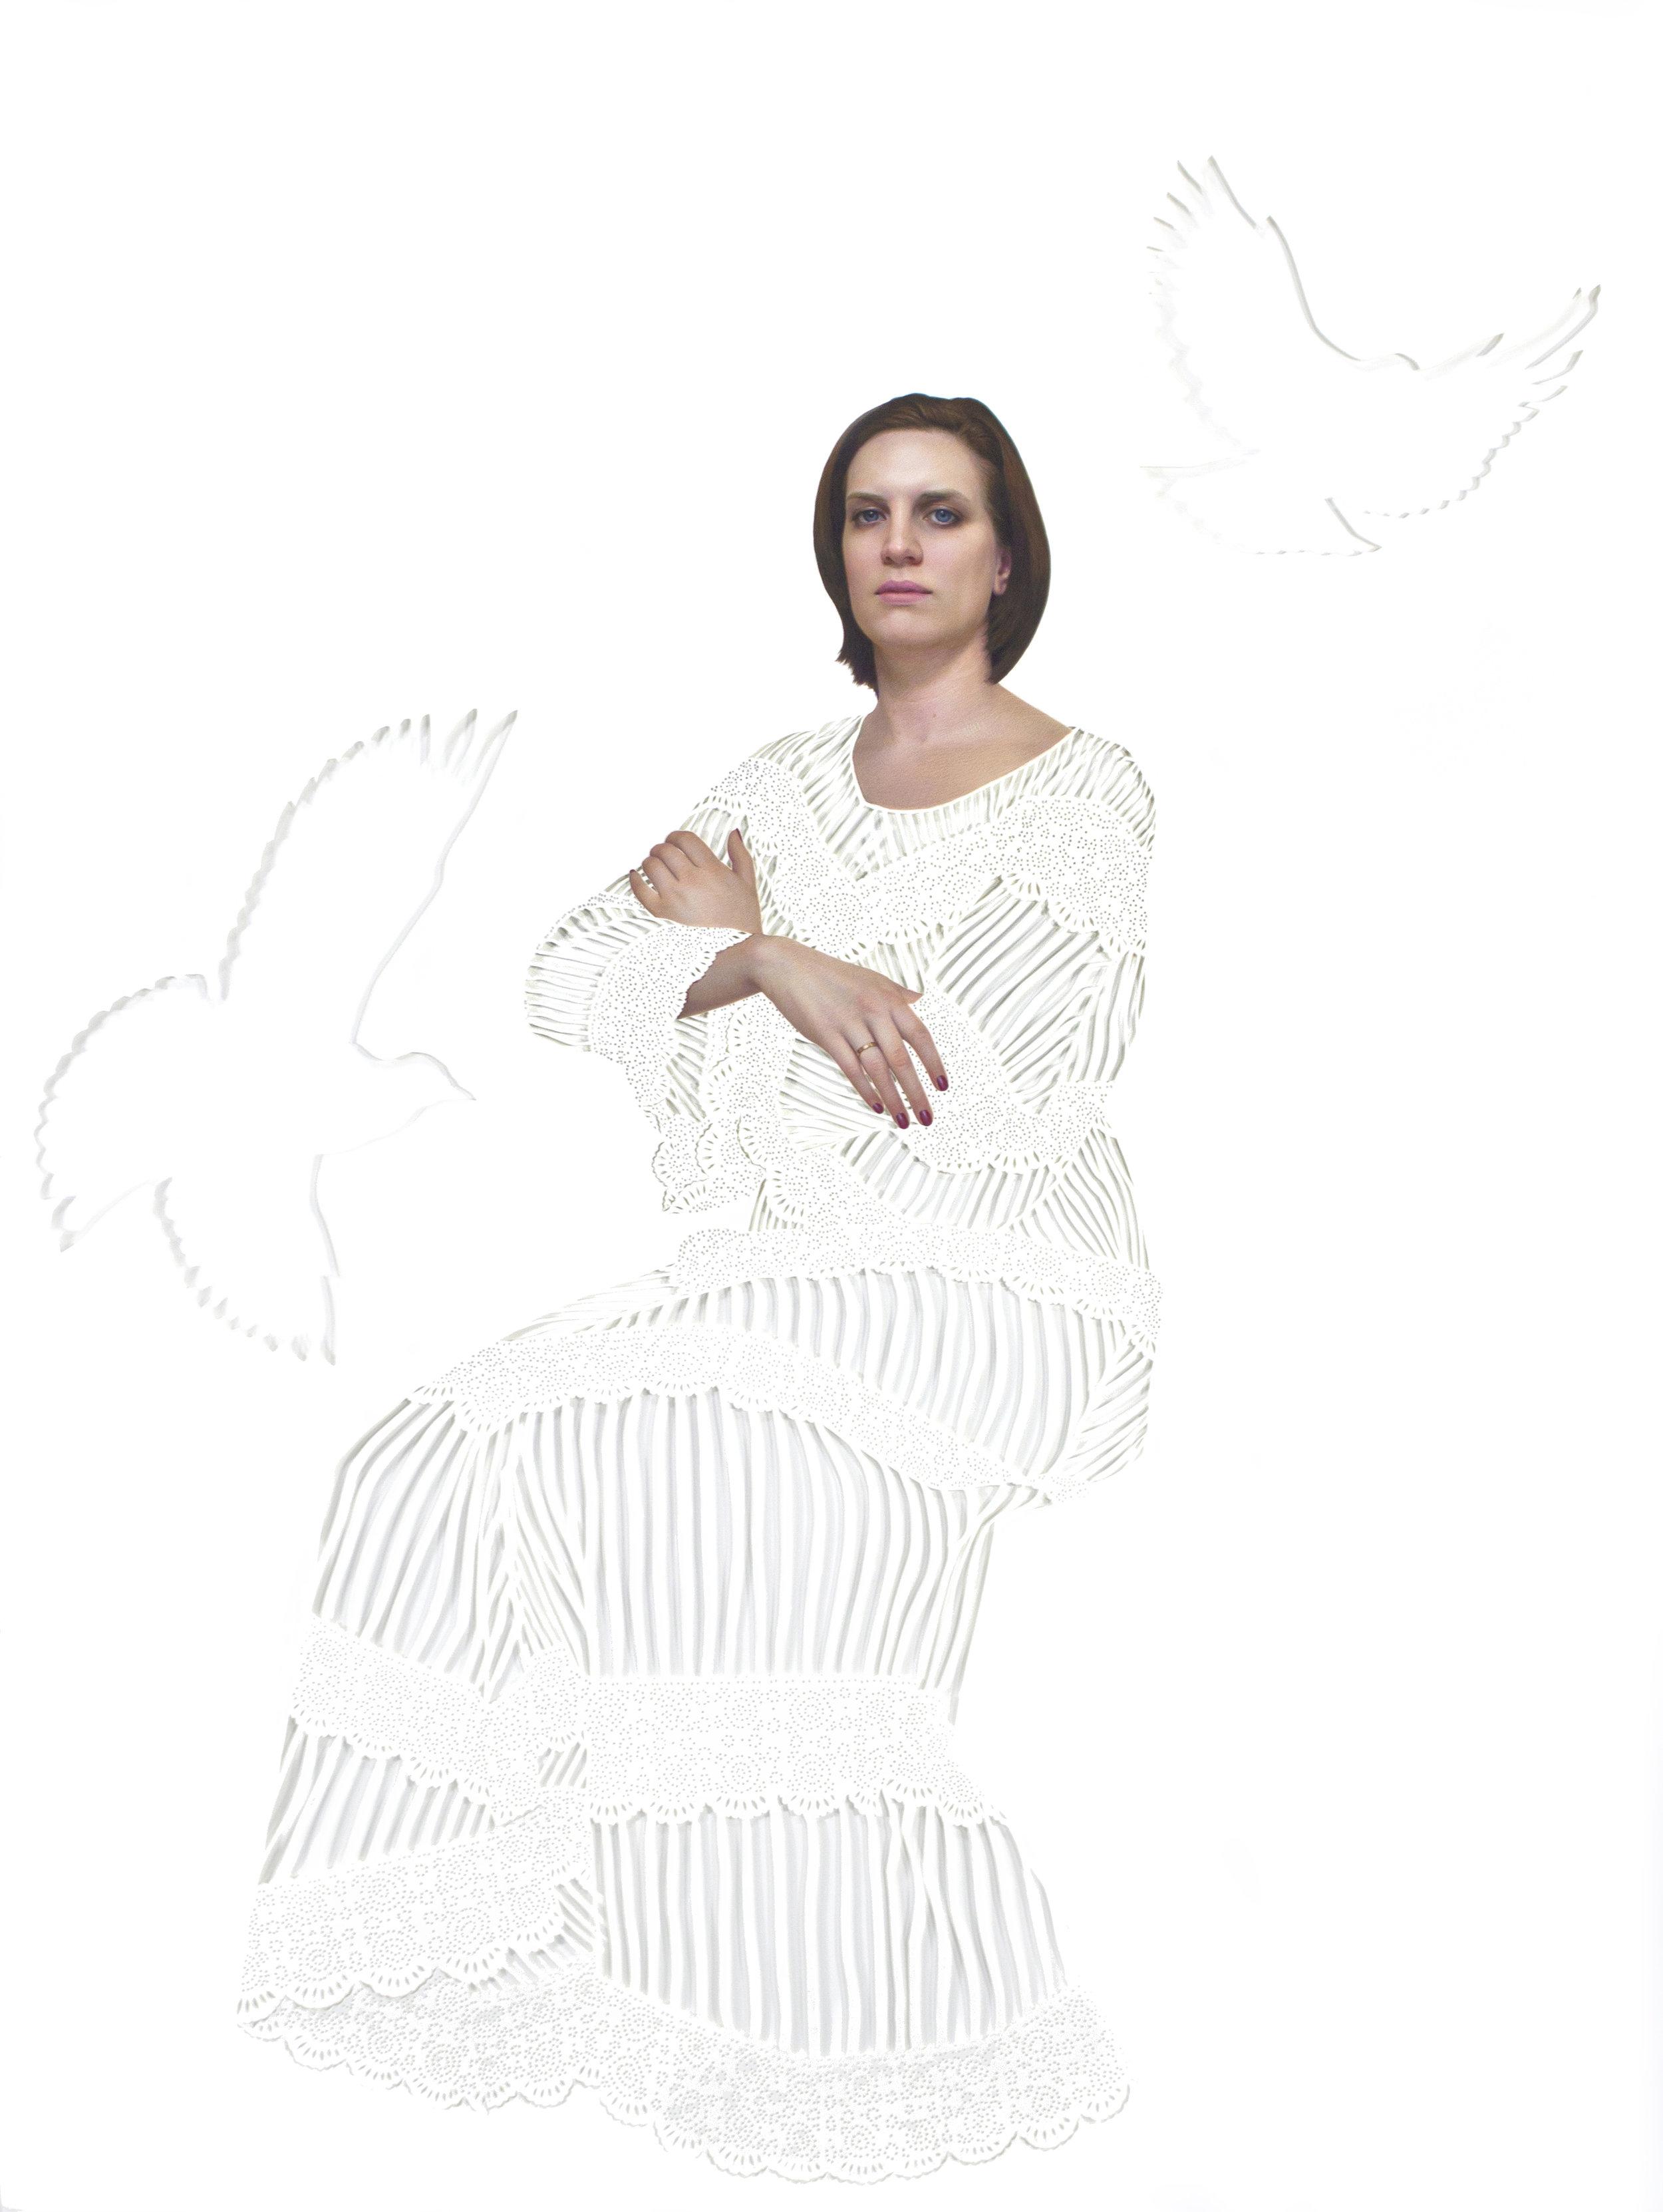 "Engagement , gouache on cut paper, 30"" x 40"" by Diana Corvelle"